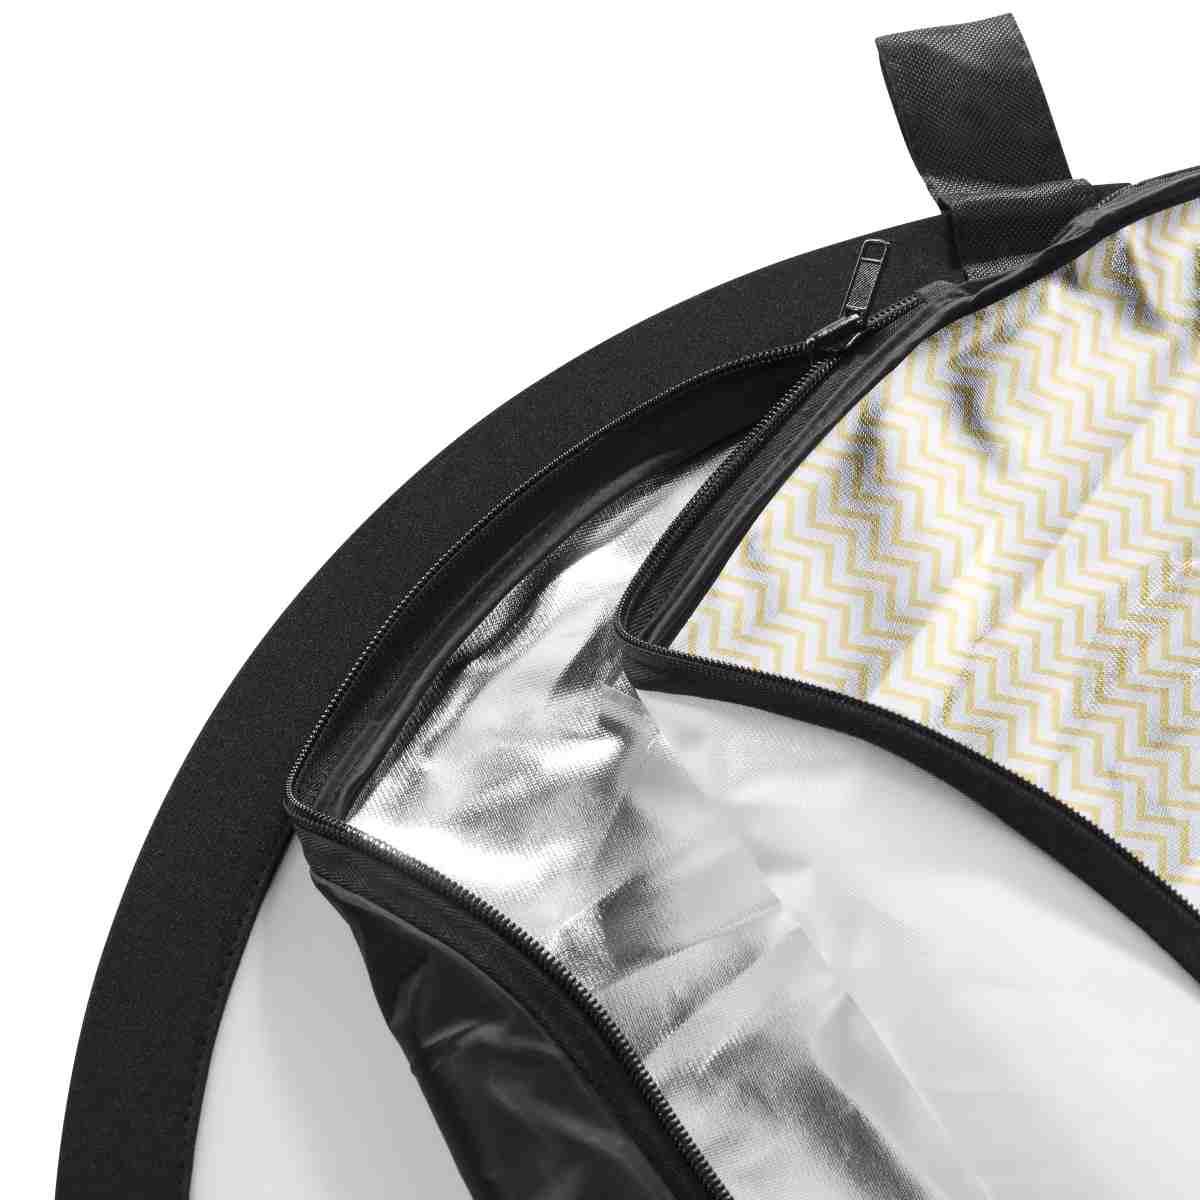 Walimex pro 5in1 Foldable Reflector wavy 150x200